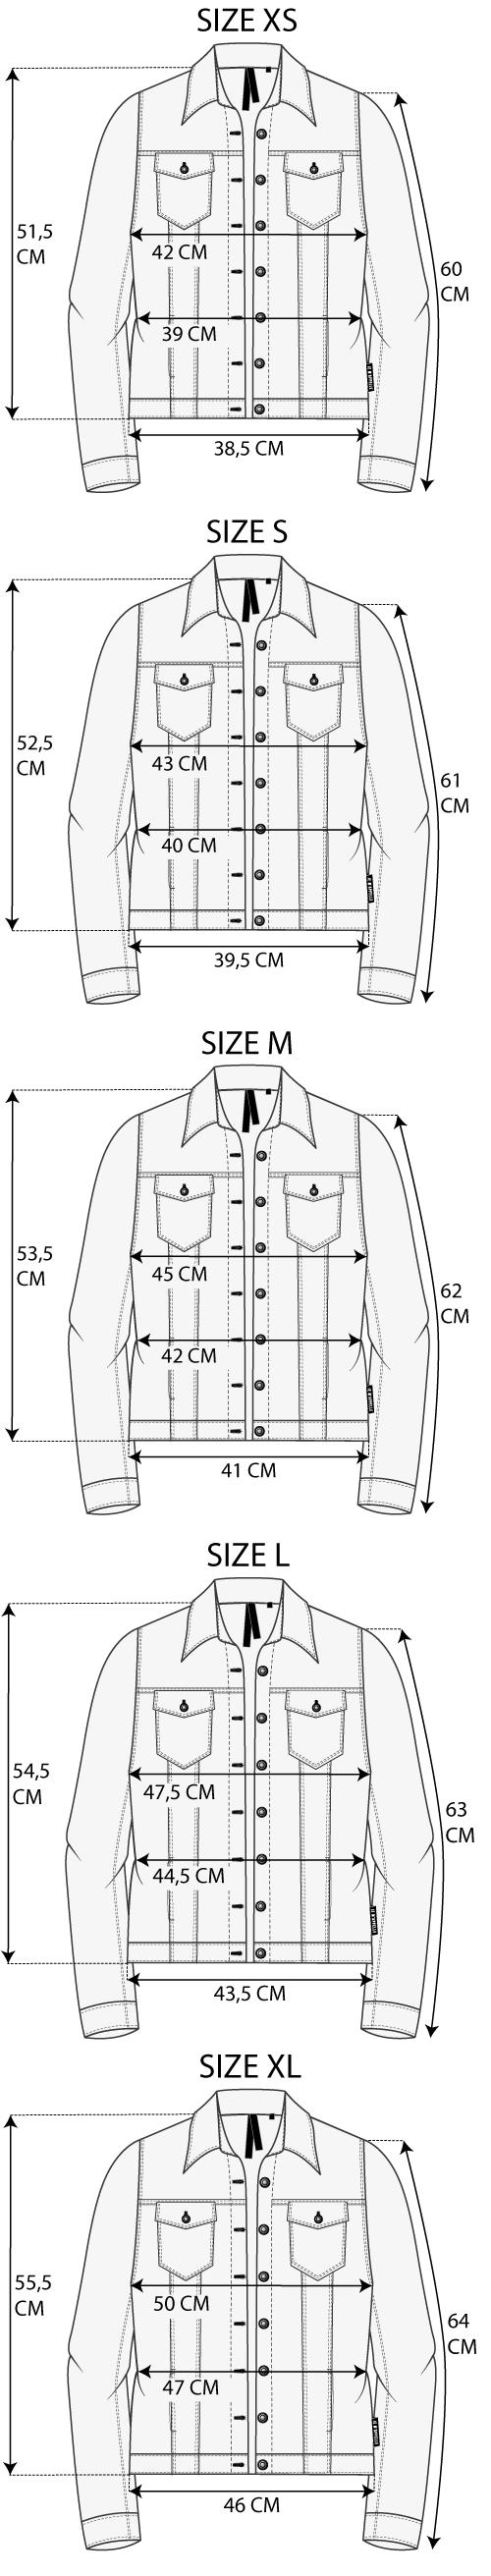 Maattabel Denim Jacket